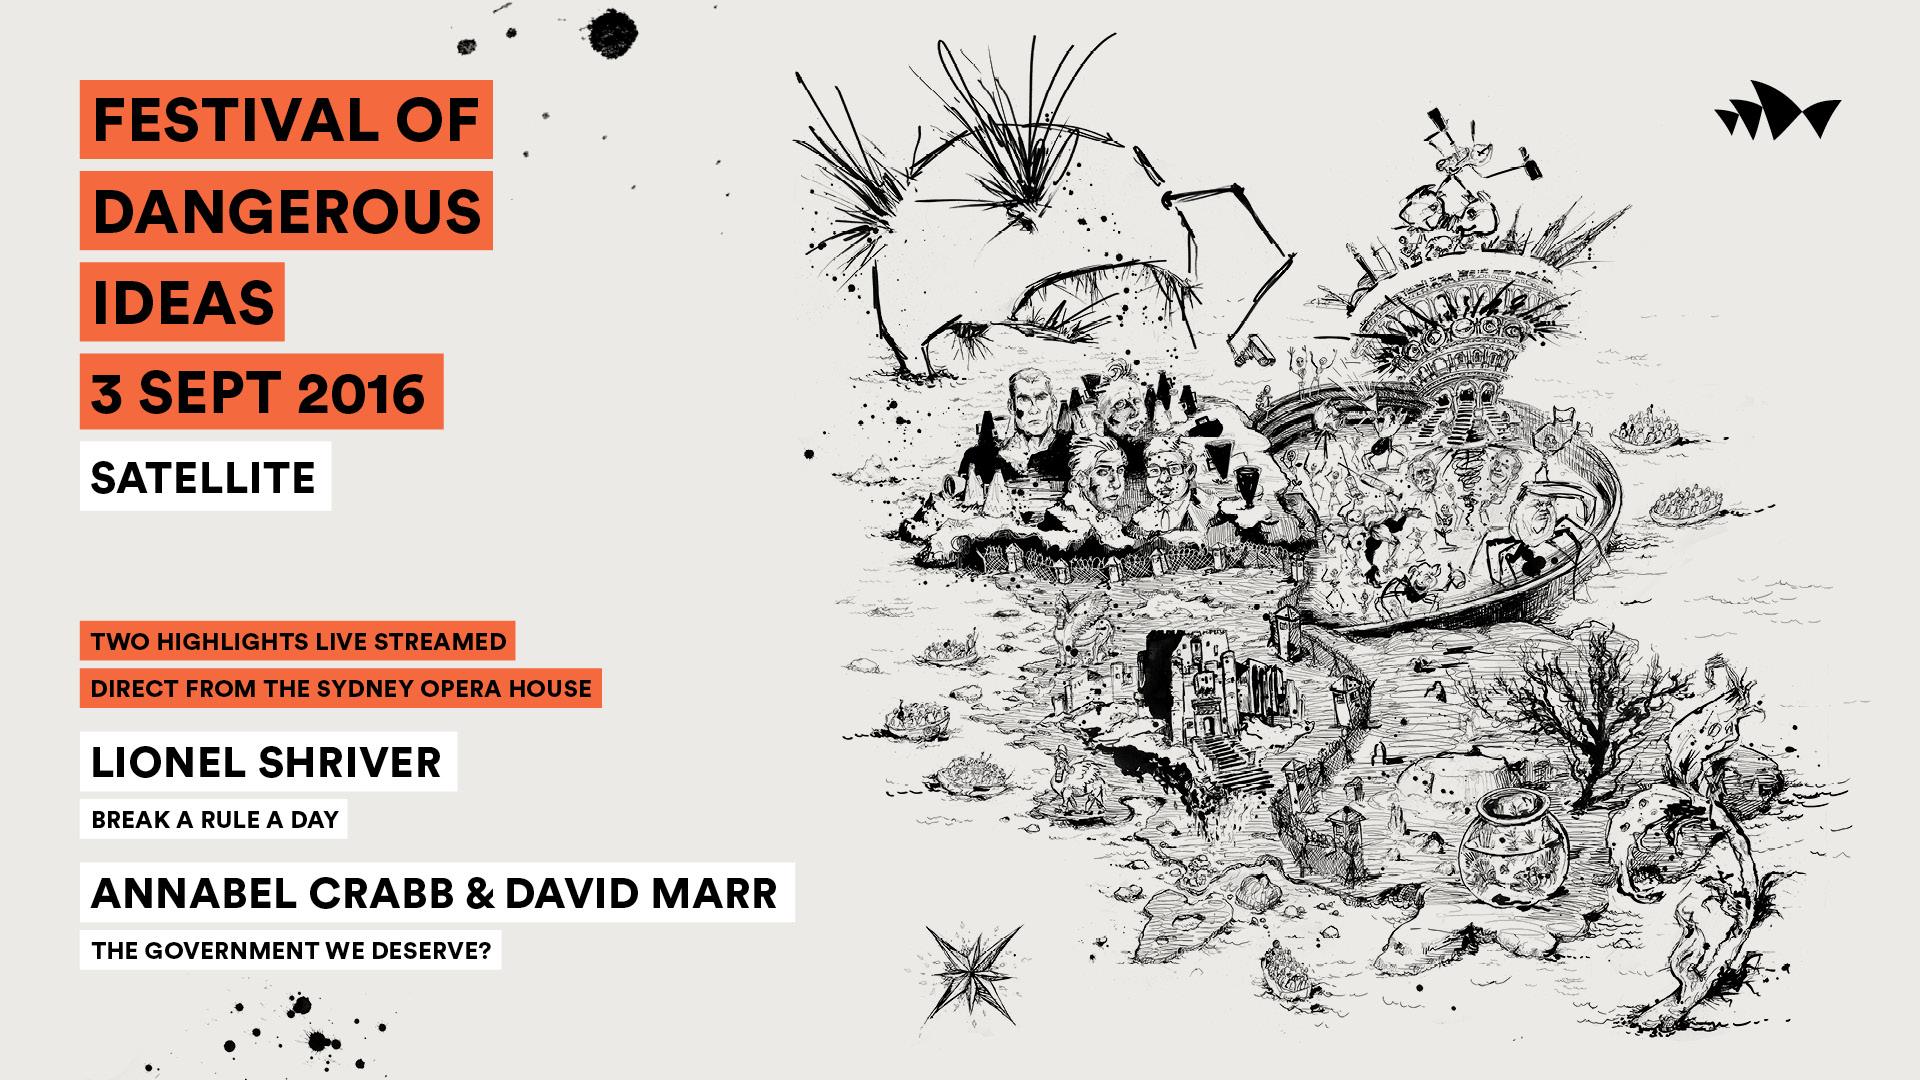 Sydney S Festival Of Dangerous Ideas To Stream Events Across Australia The Au Review